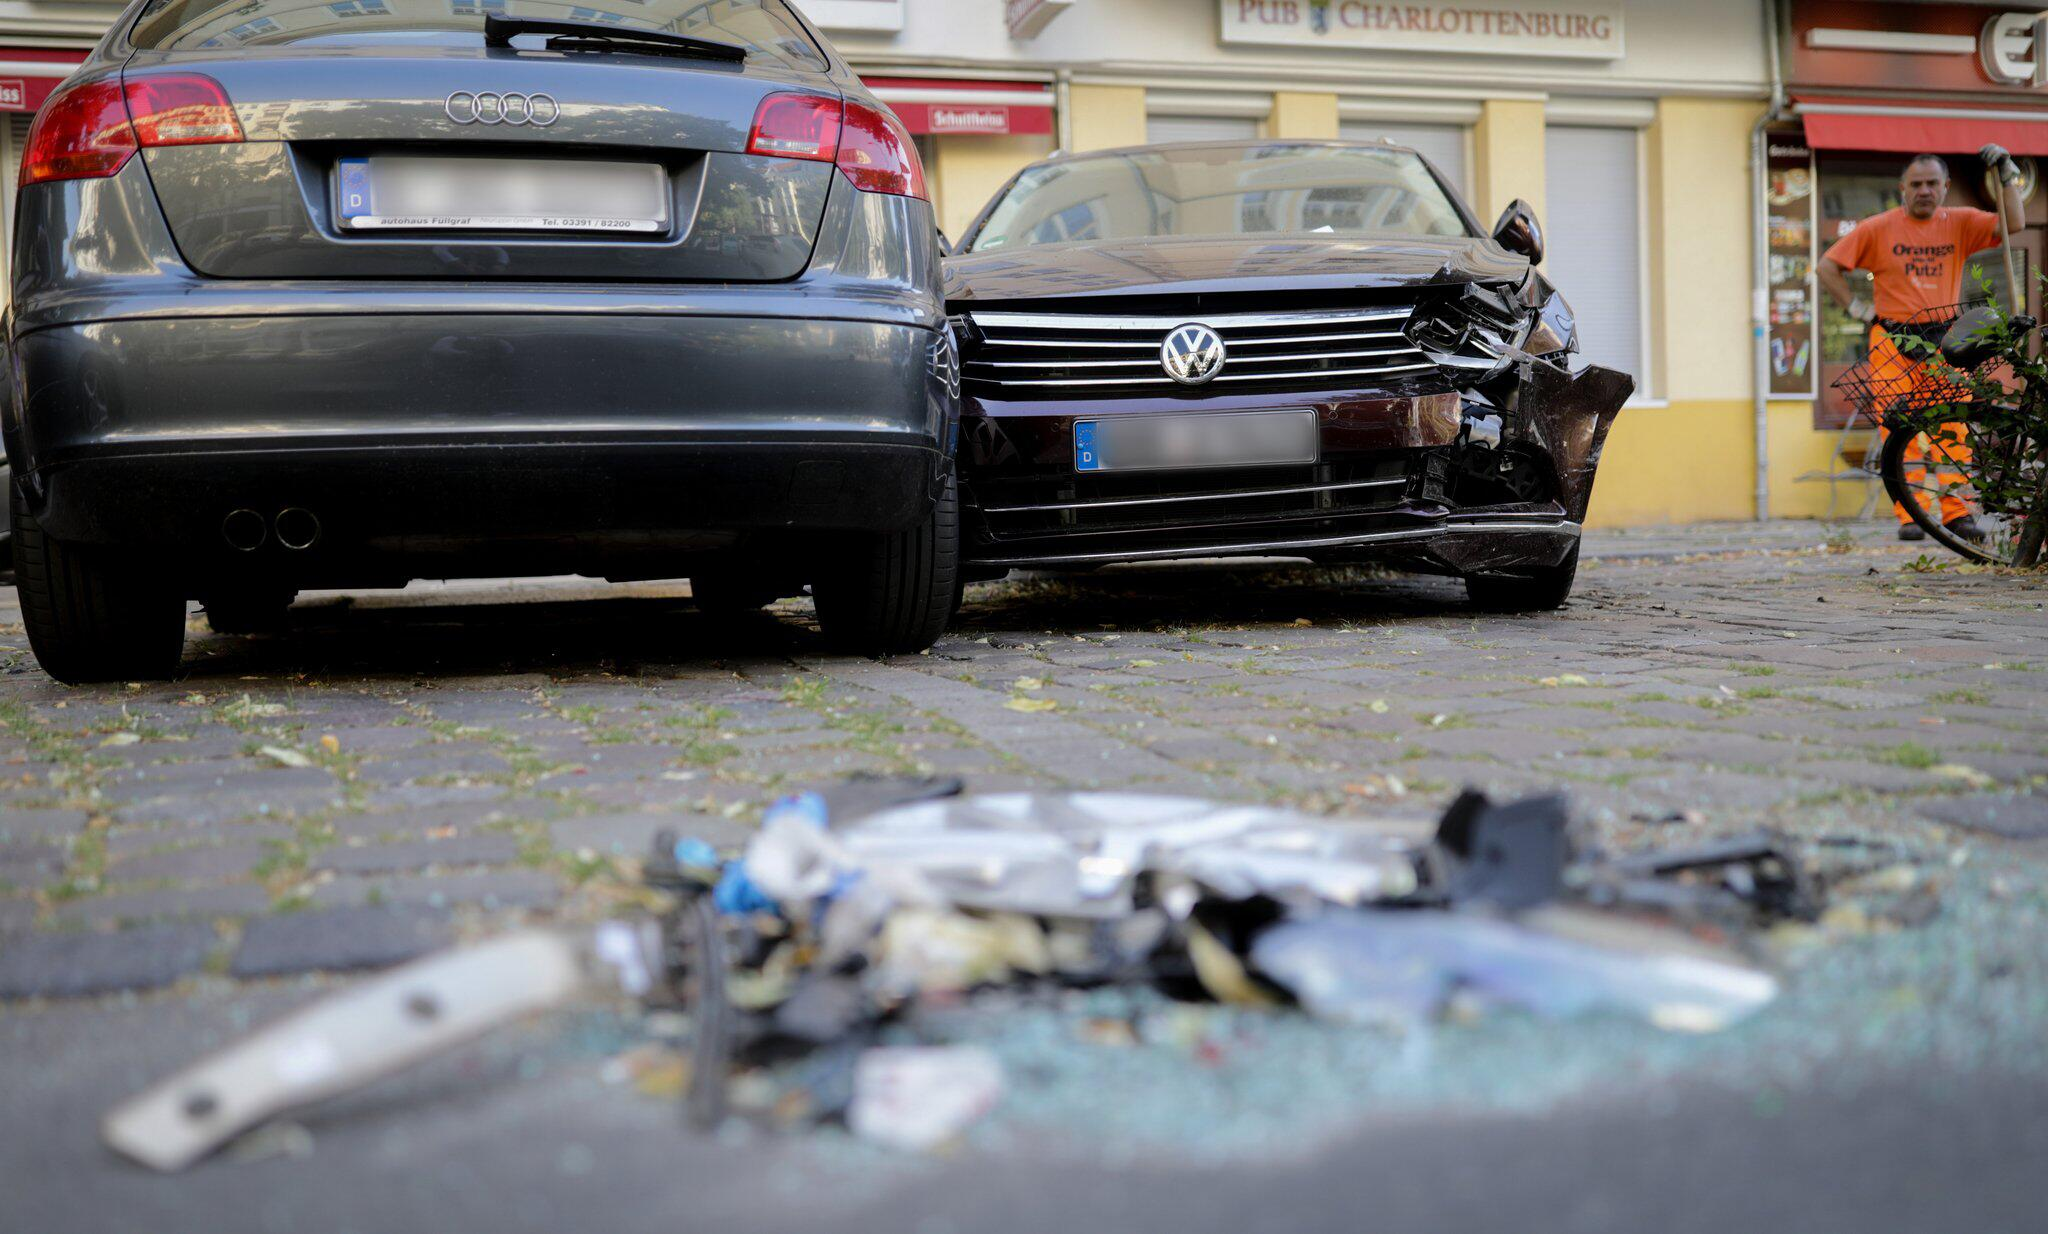 Bild zu Radlerin bei Verfolgungsjagd in Berlin getötet